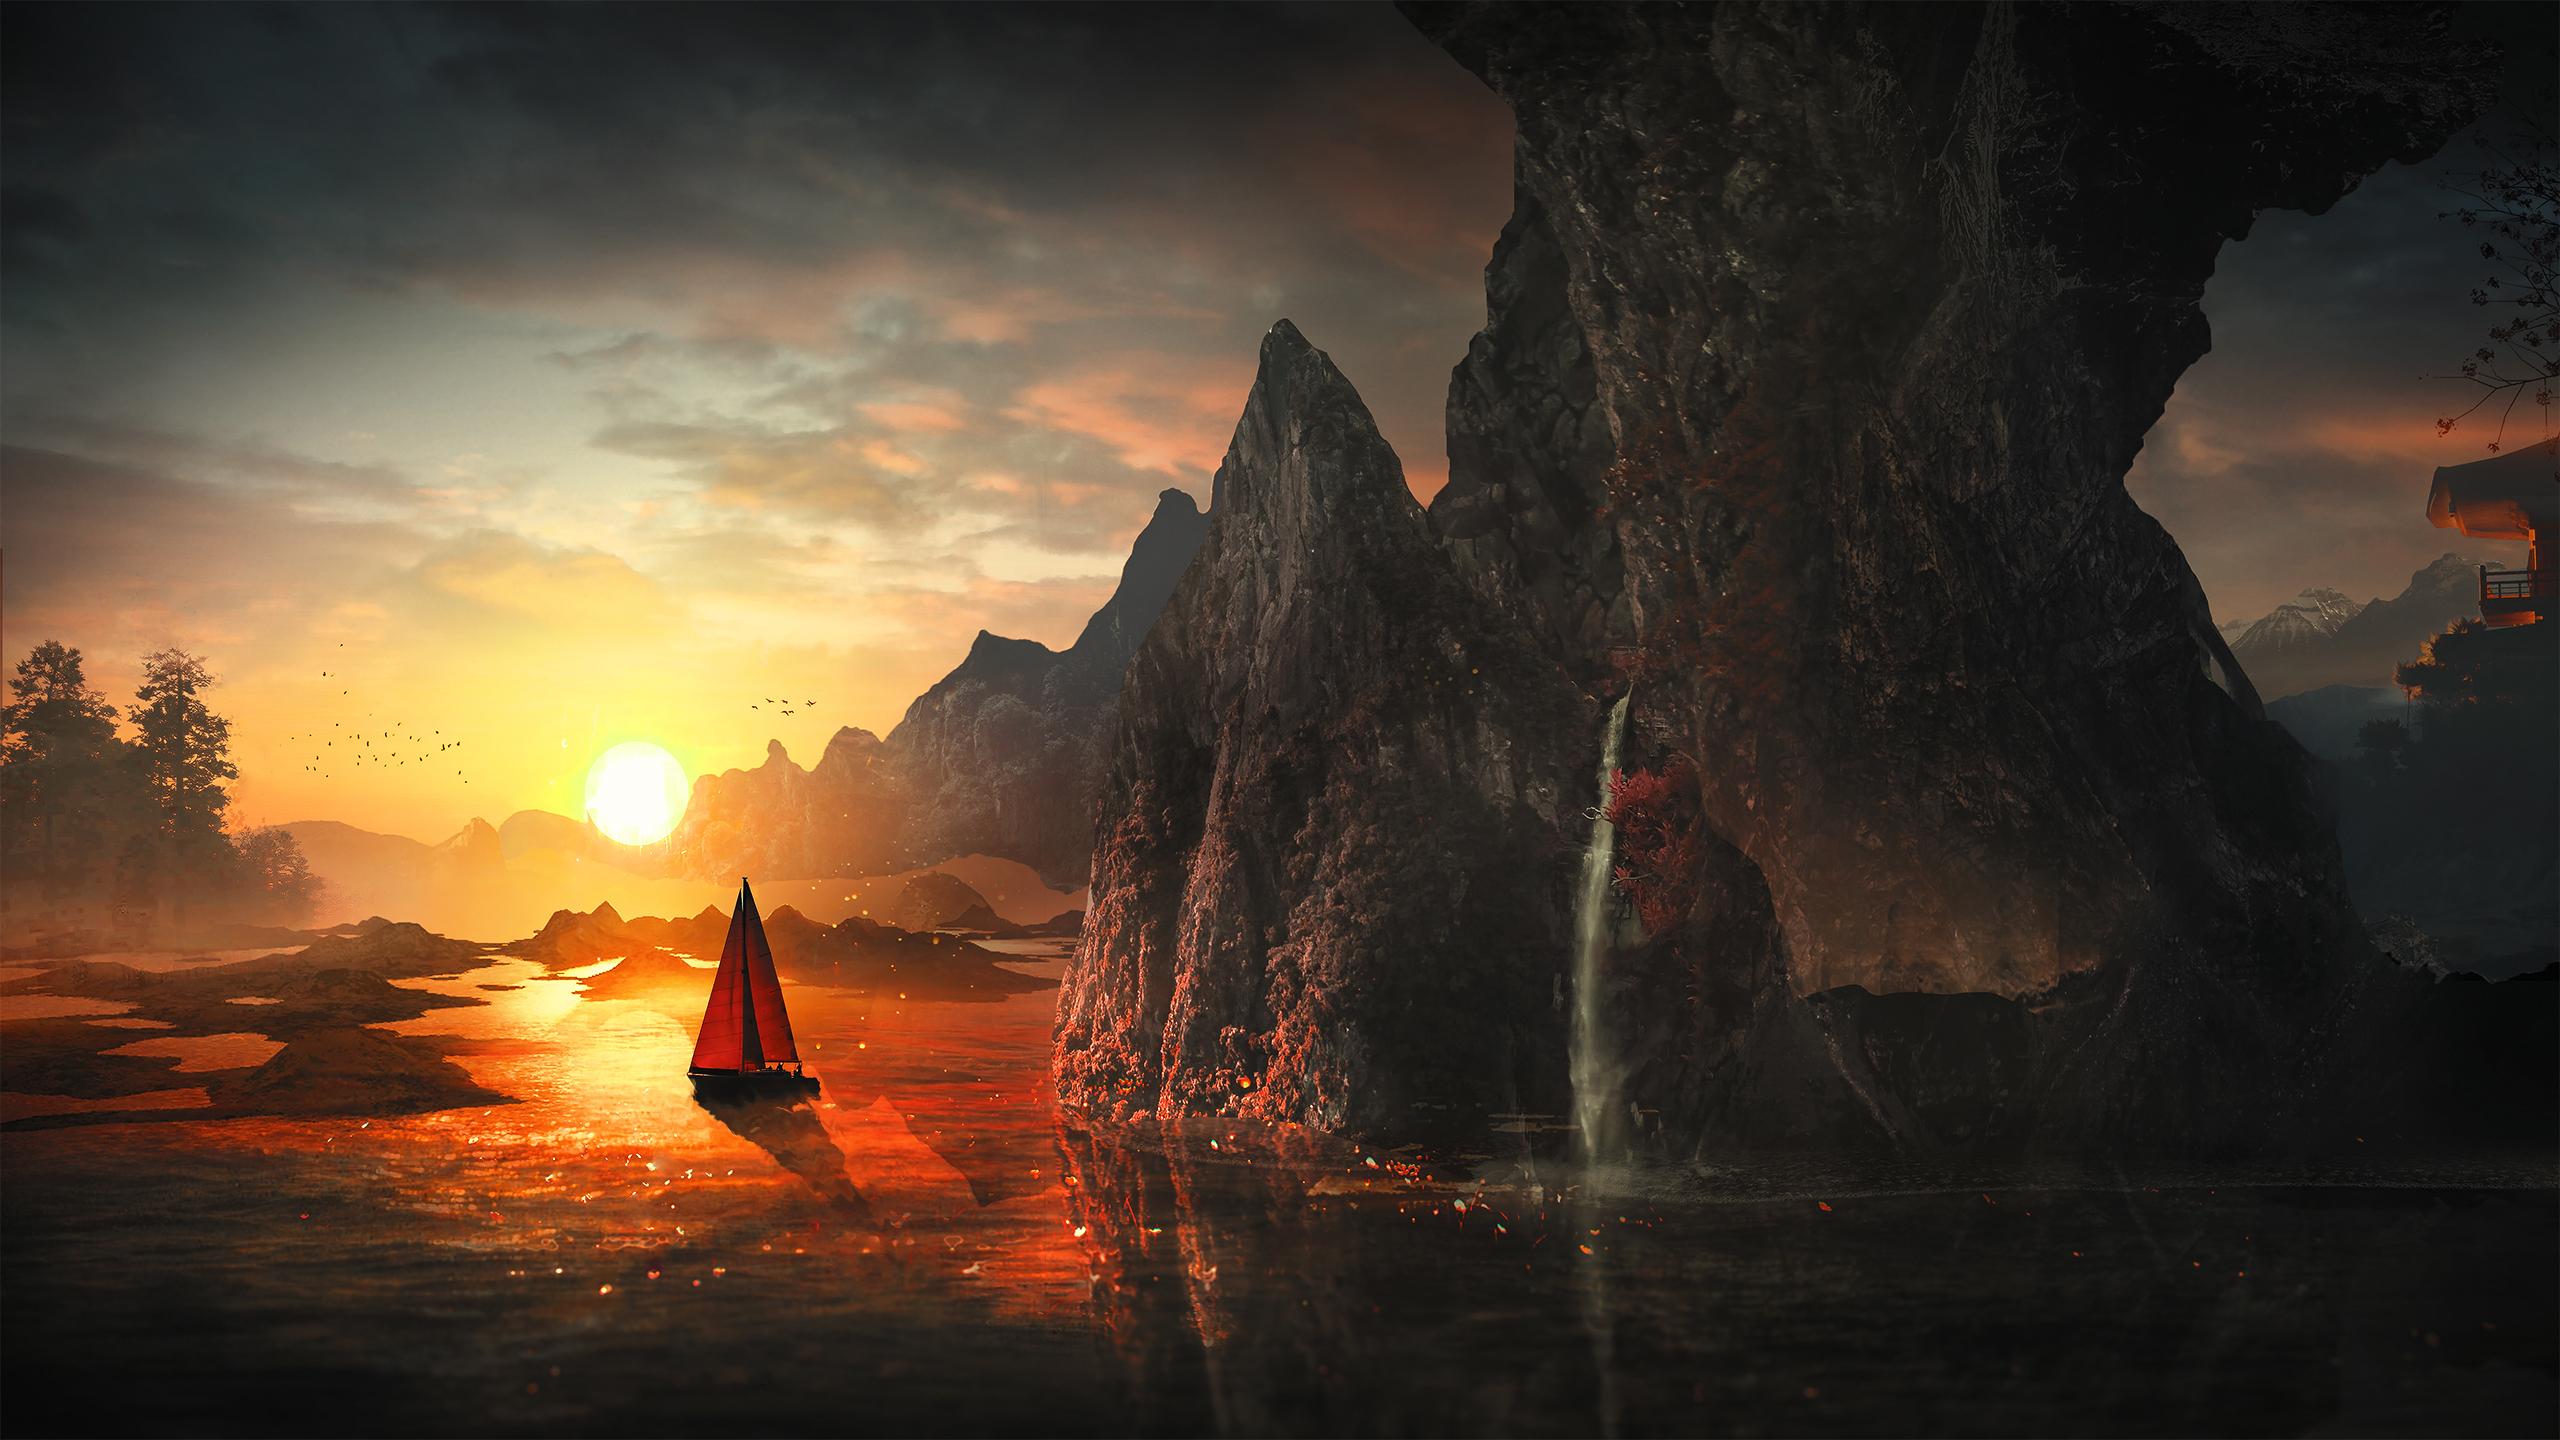 harmony-boat-creative-background-nr.jpg